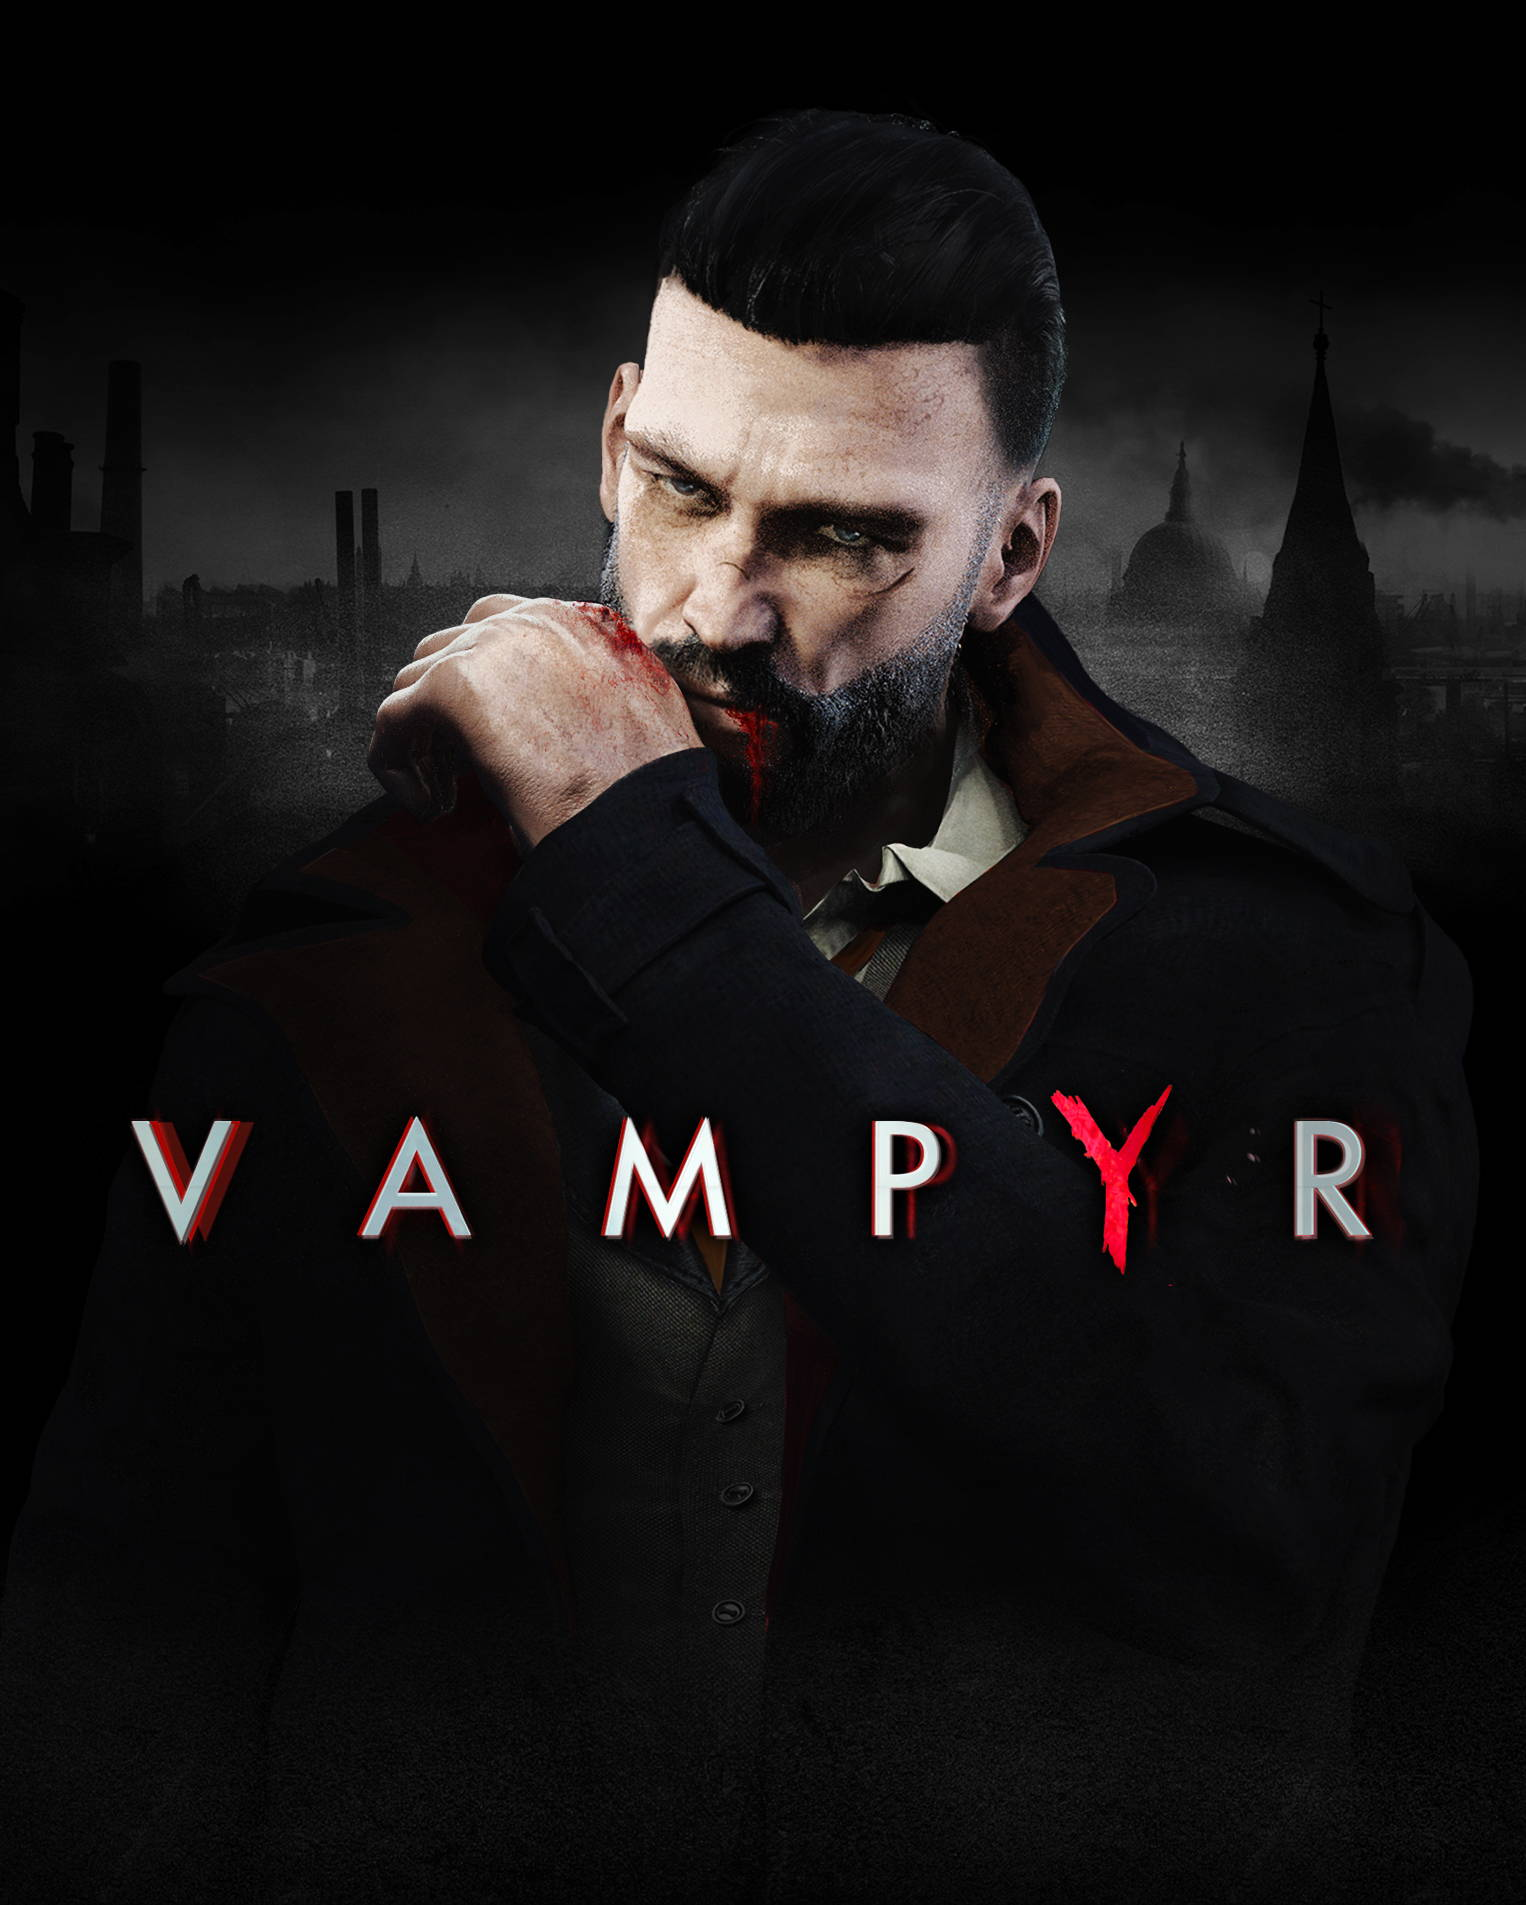 vampyr_images_0001